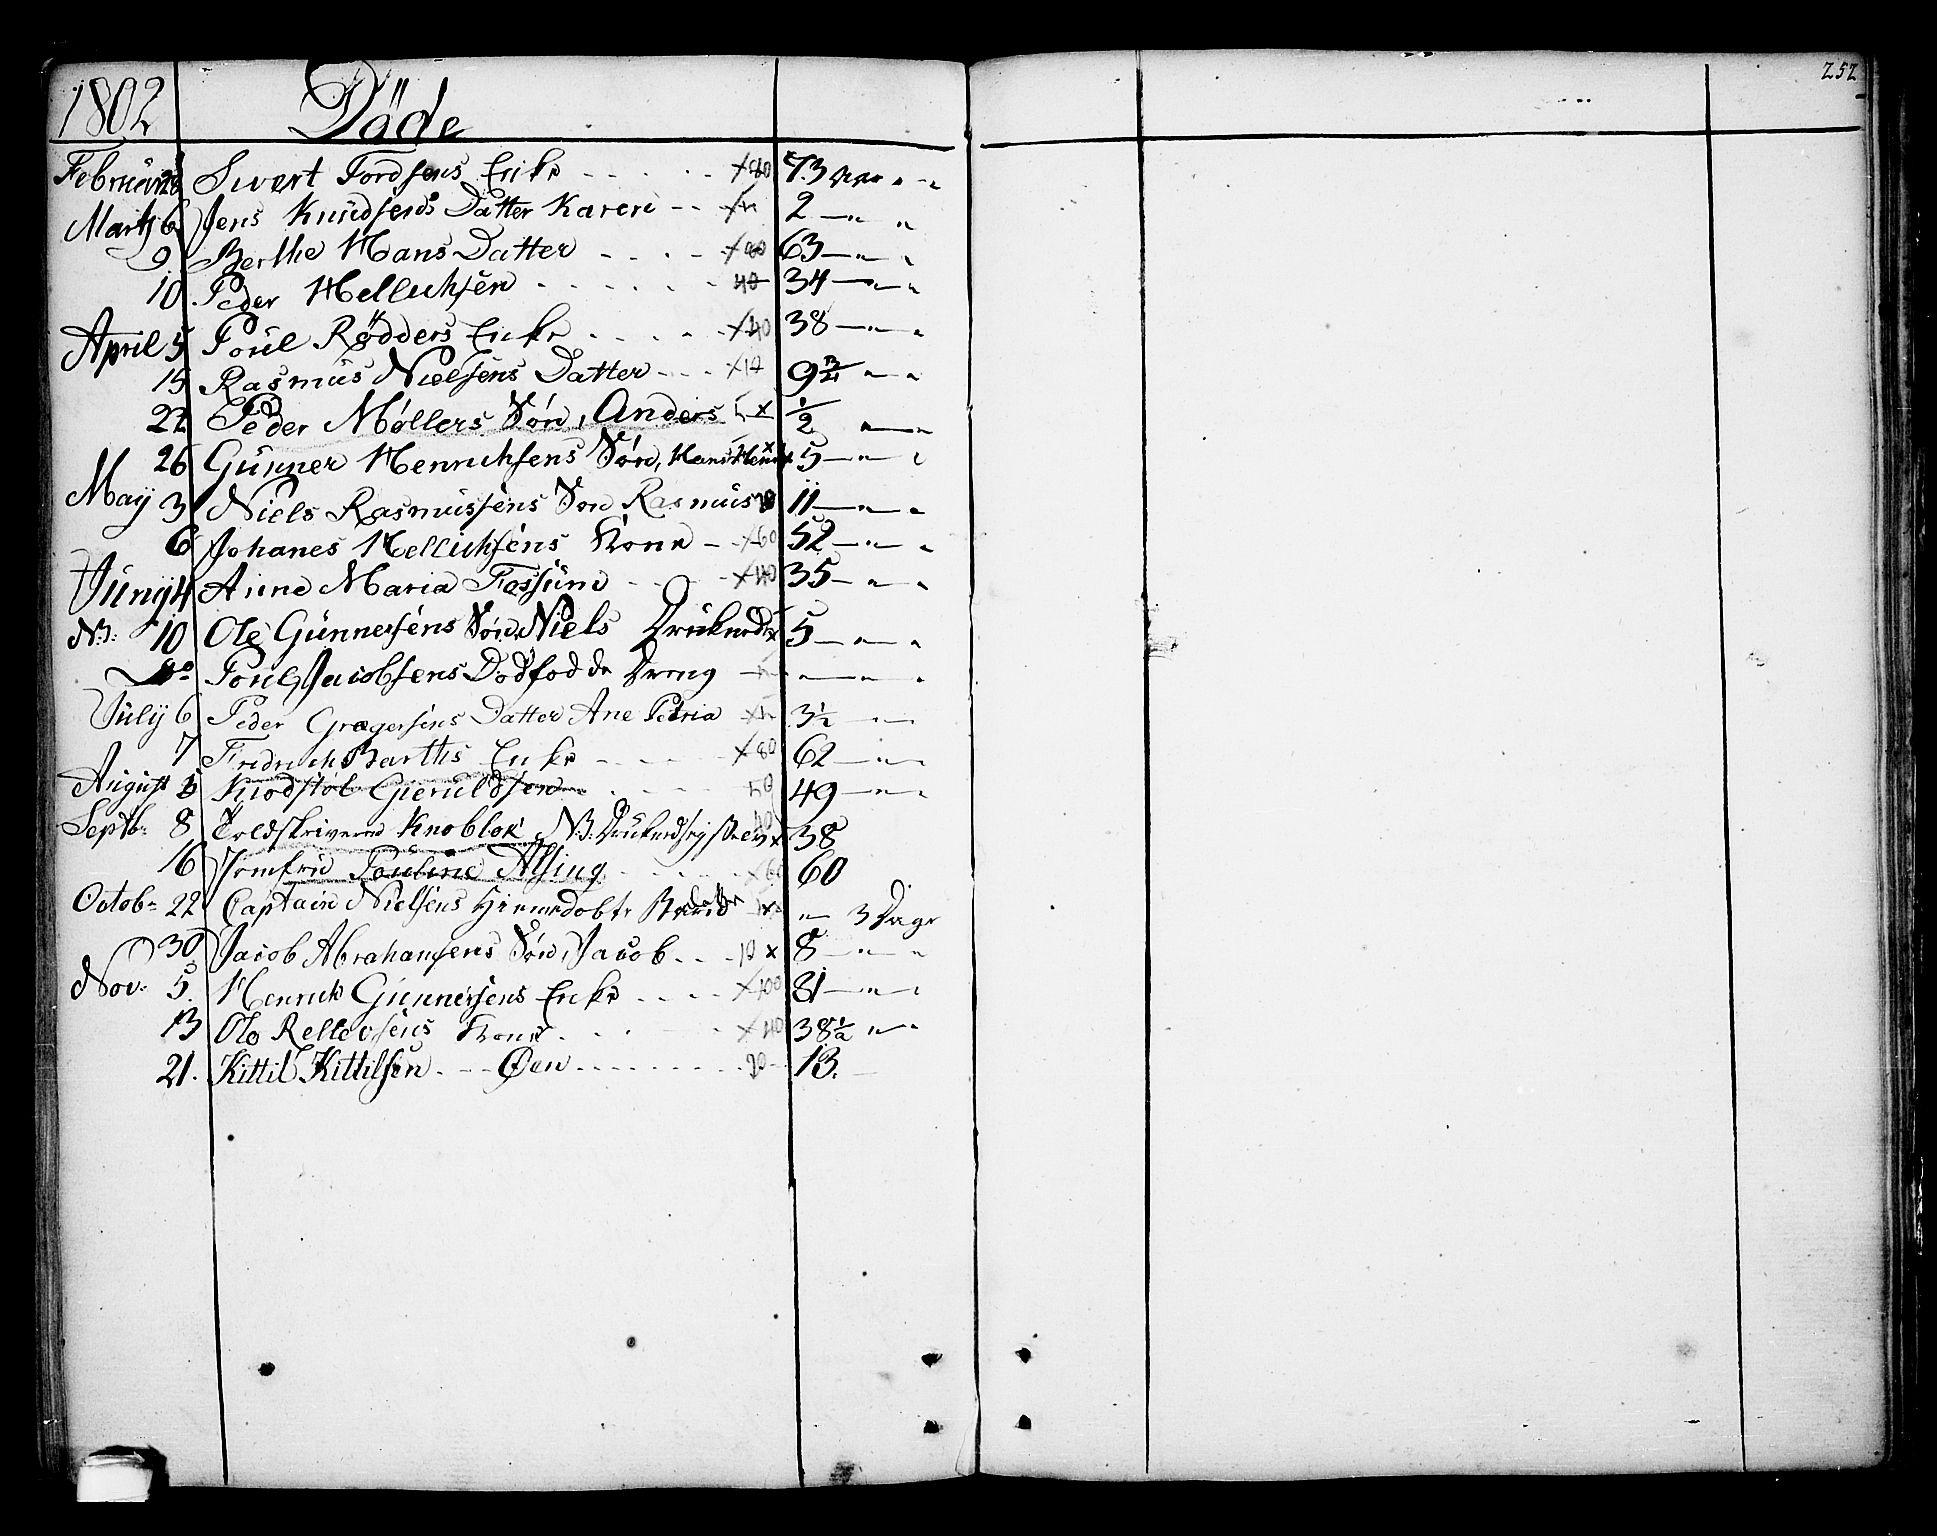 SAKO, Kragerø kirkebøker, F/Fa/L0002: Ministerialbok nr. 2, 1767-1802, s. 252